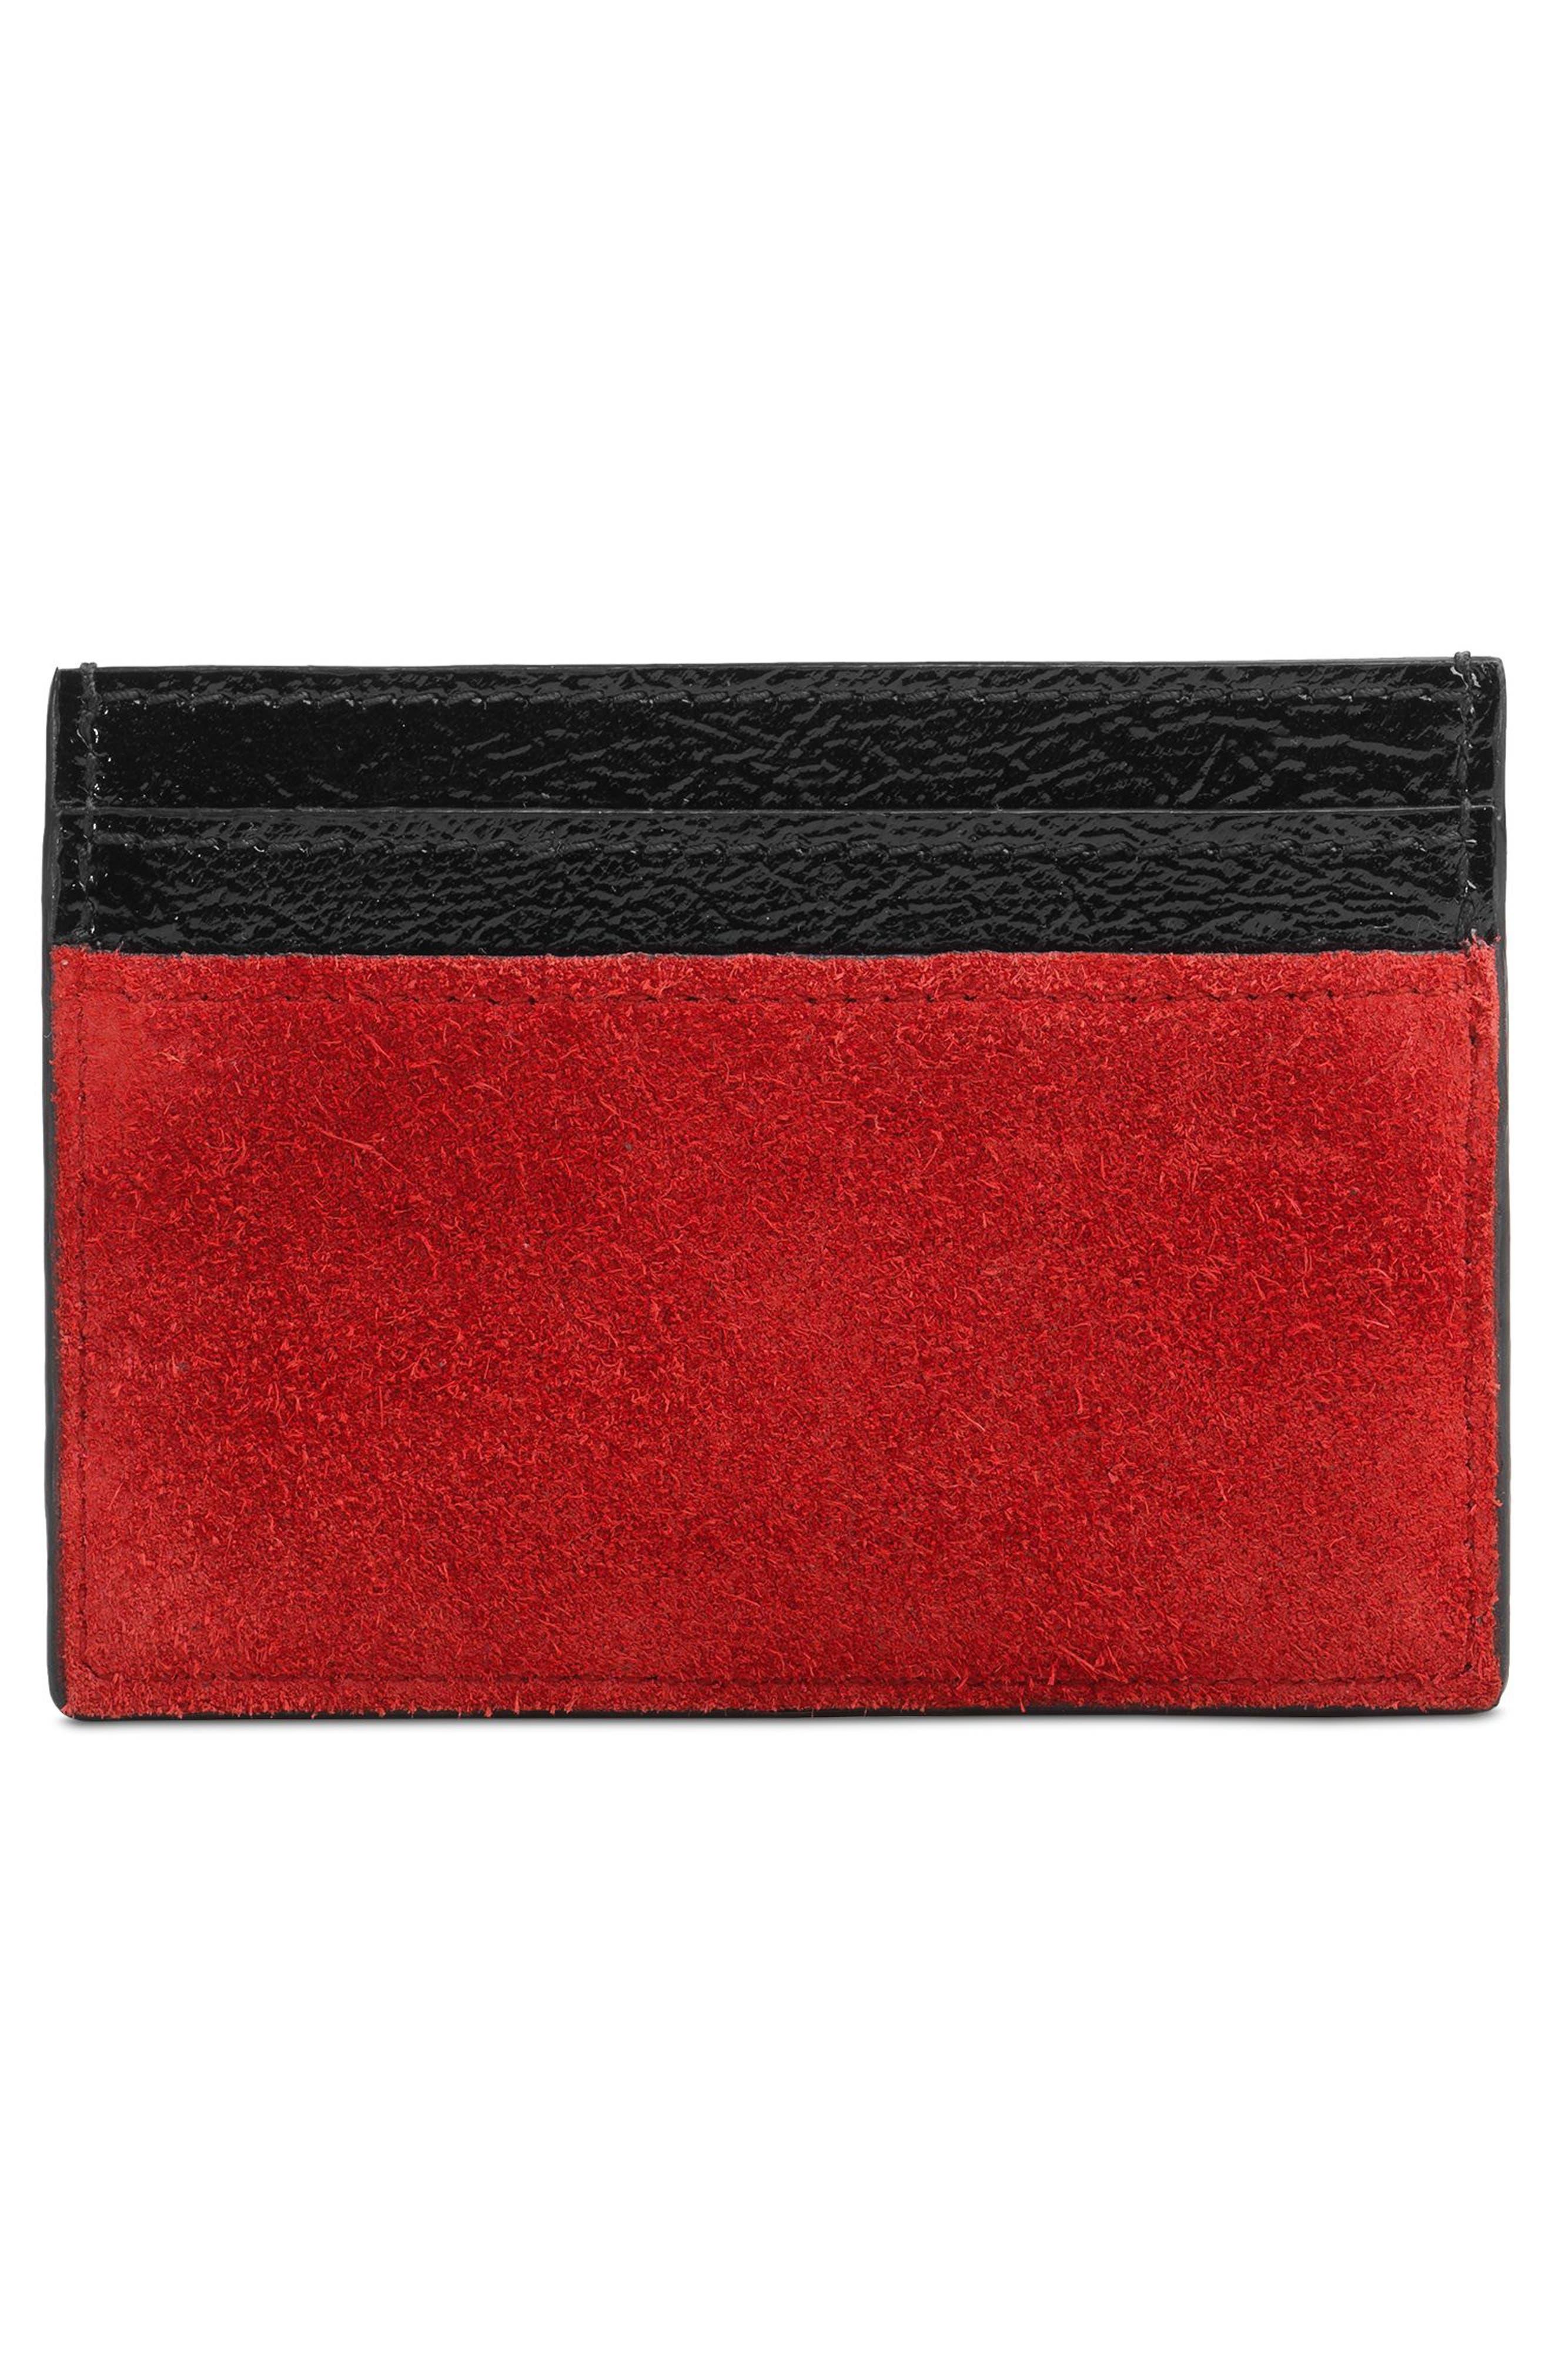 Alternate Image 3  - Gucci Ophidia Suede Card Case